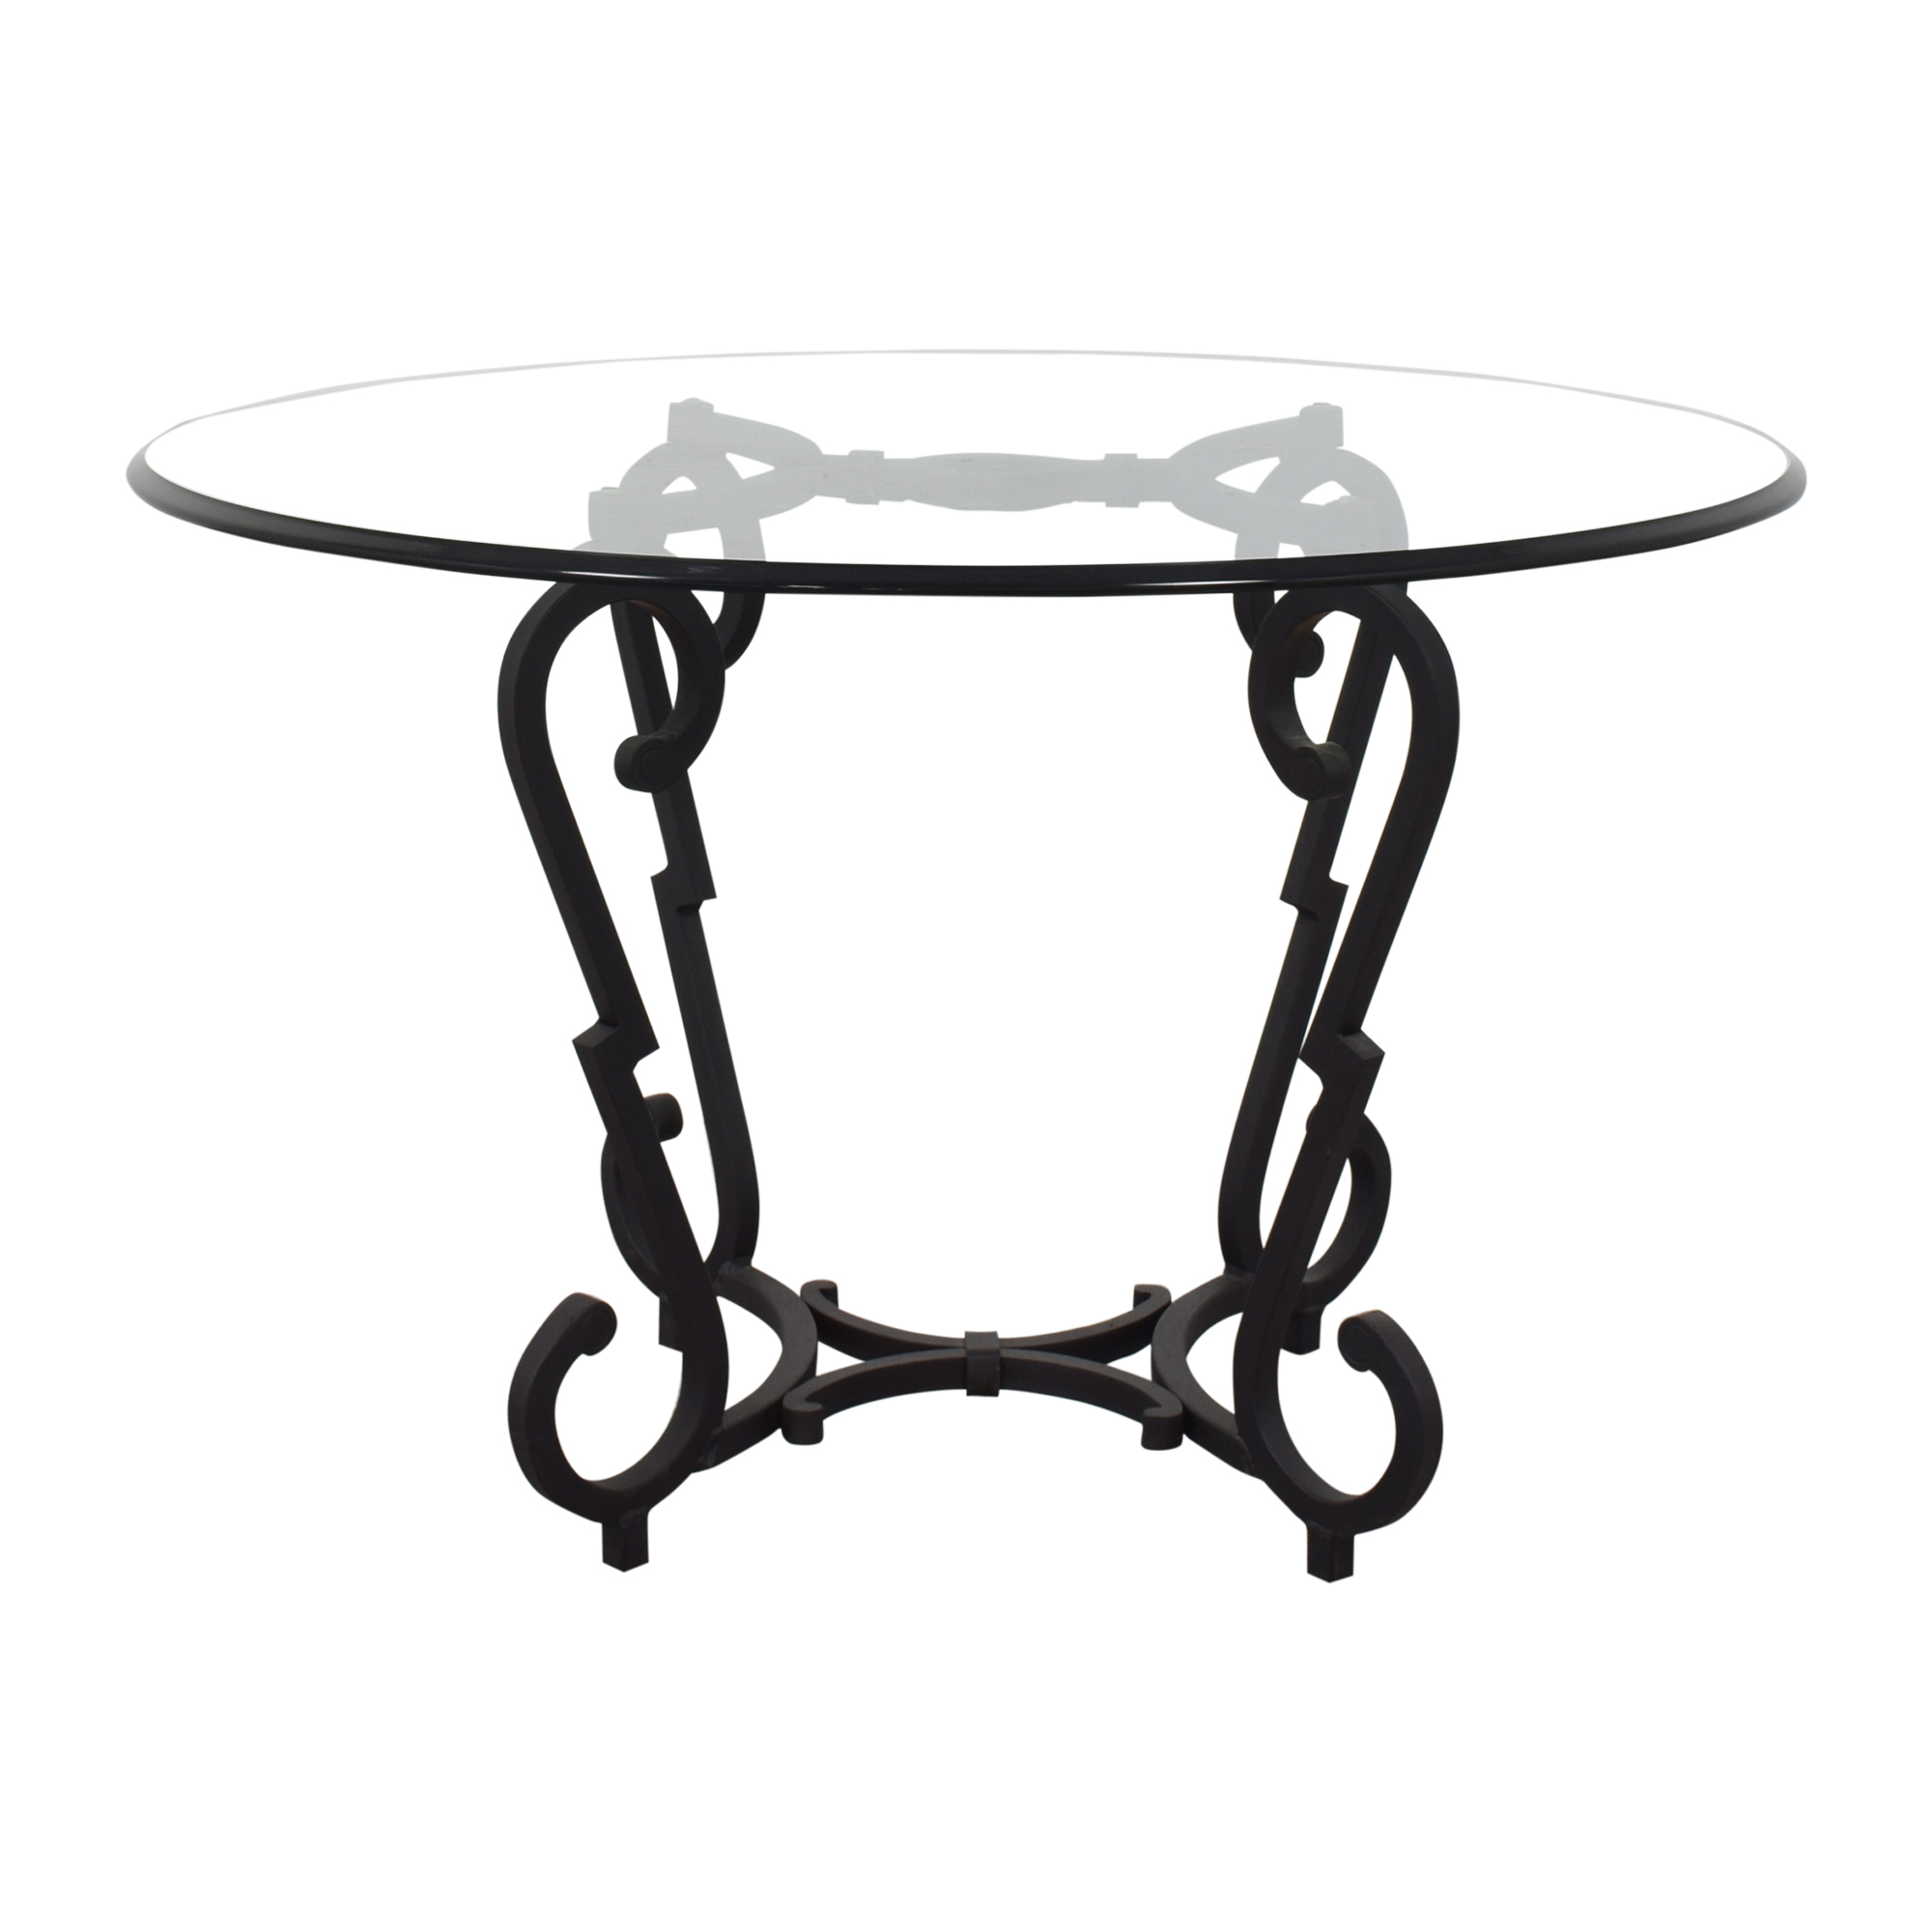 buy Arteriors Arteriors Transparent Round Foyer Table online